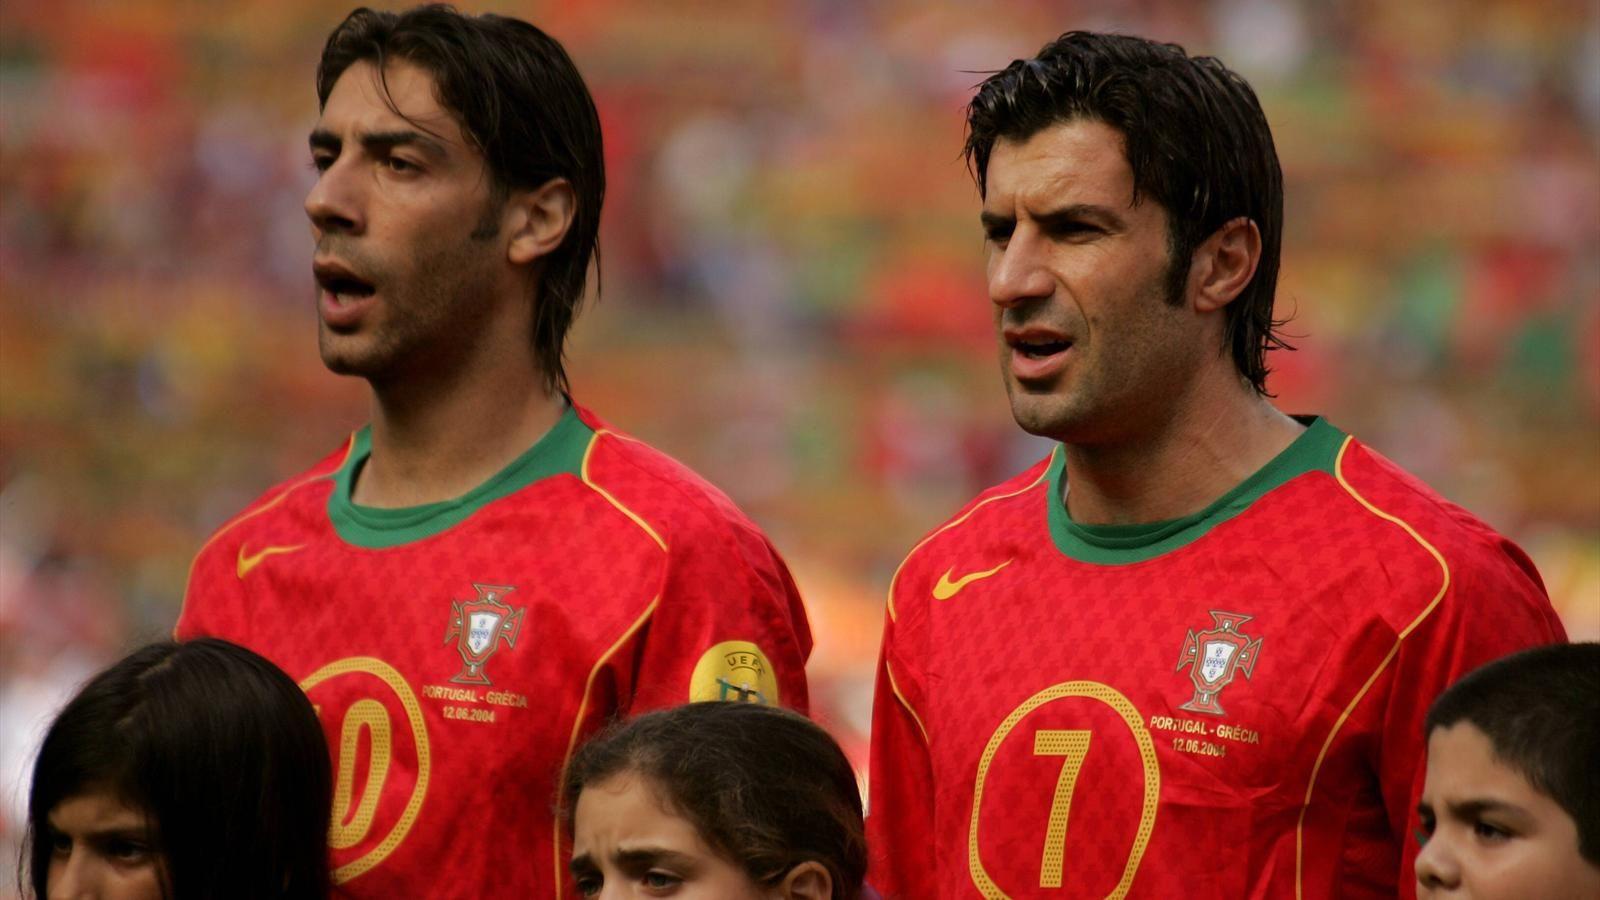 Manuel Rui Costa & Luis Figo Portugal